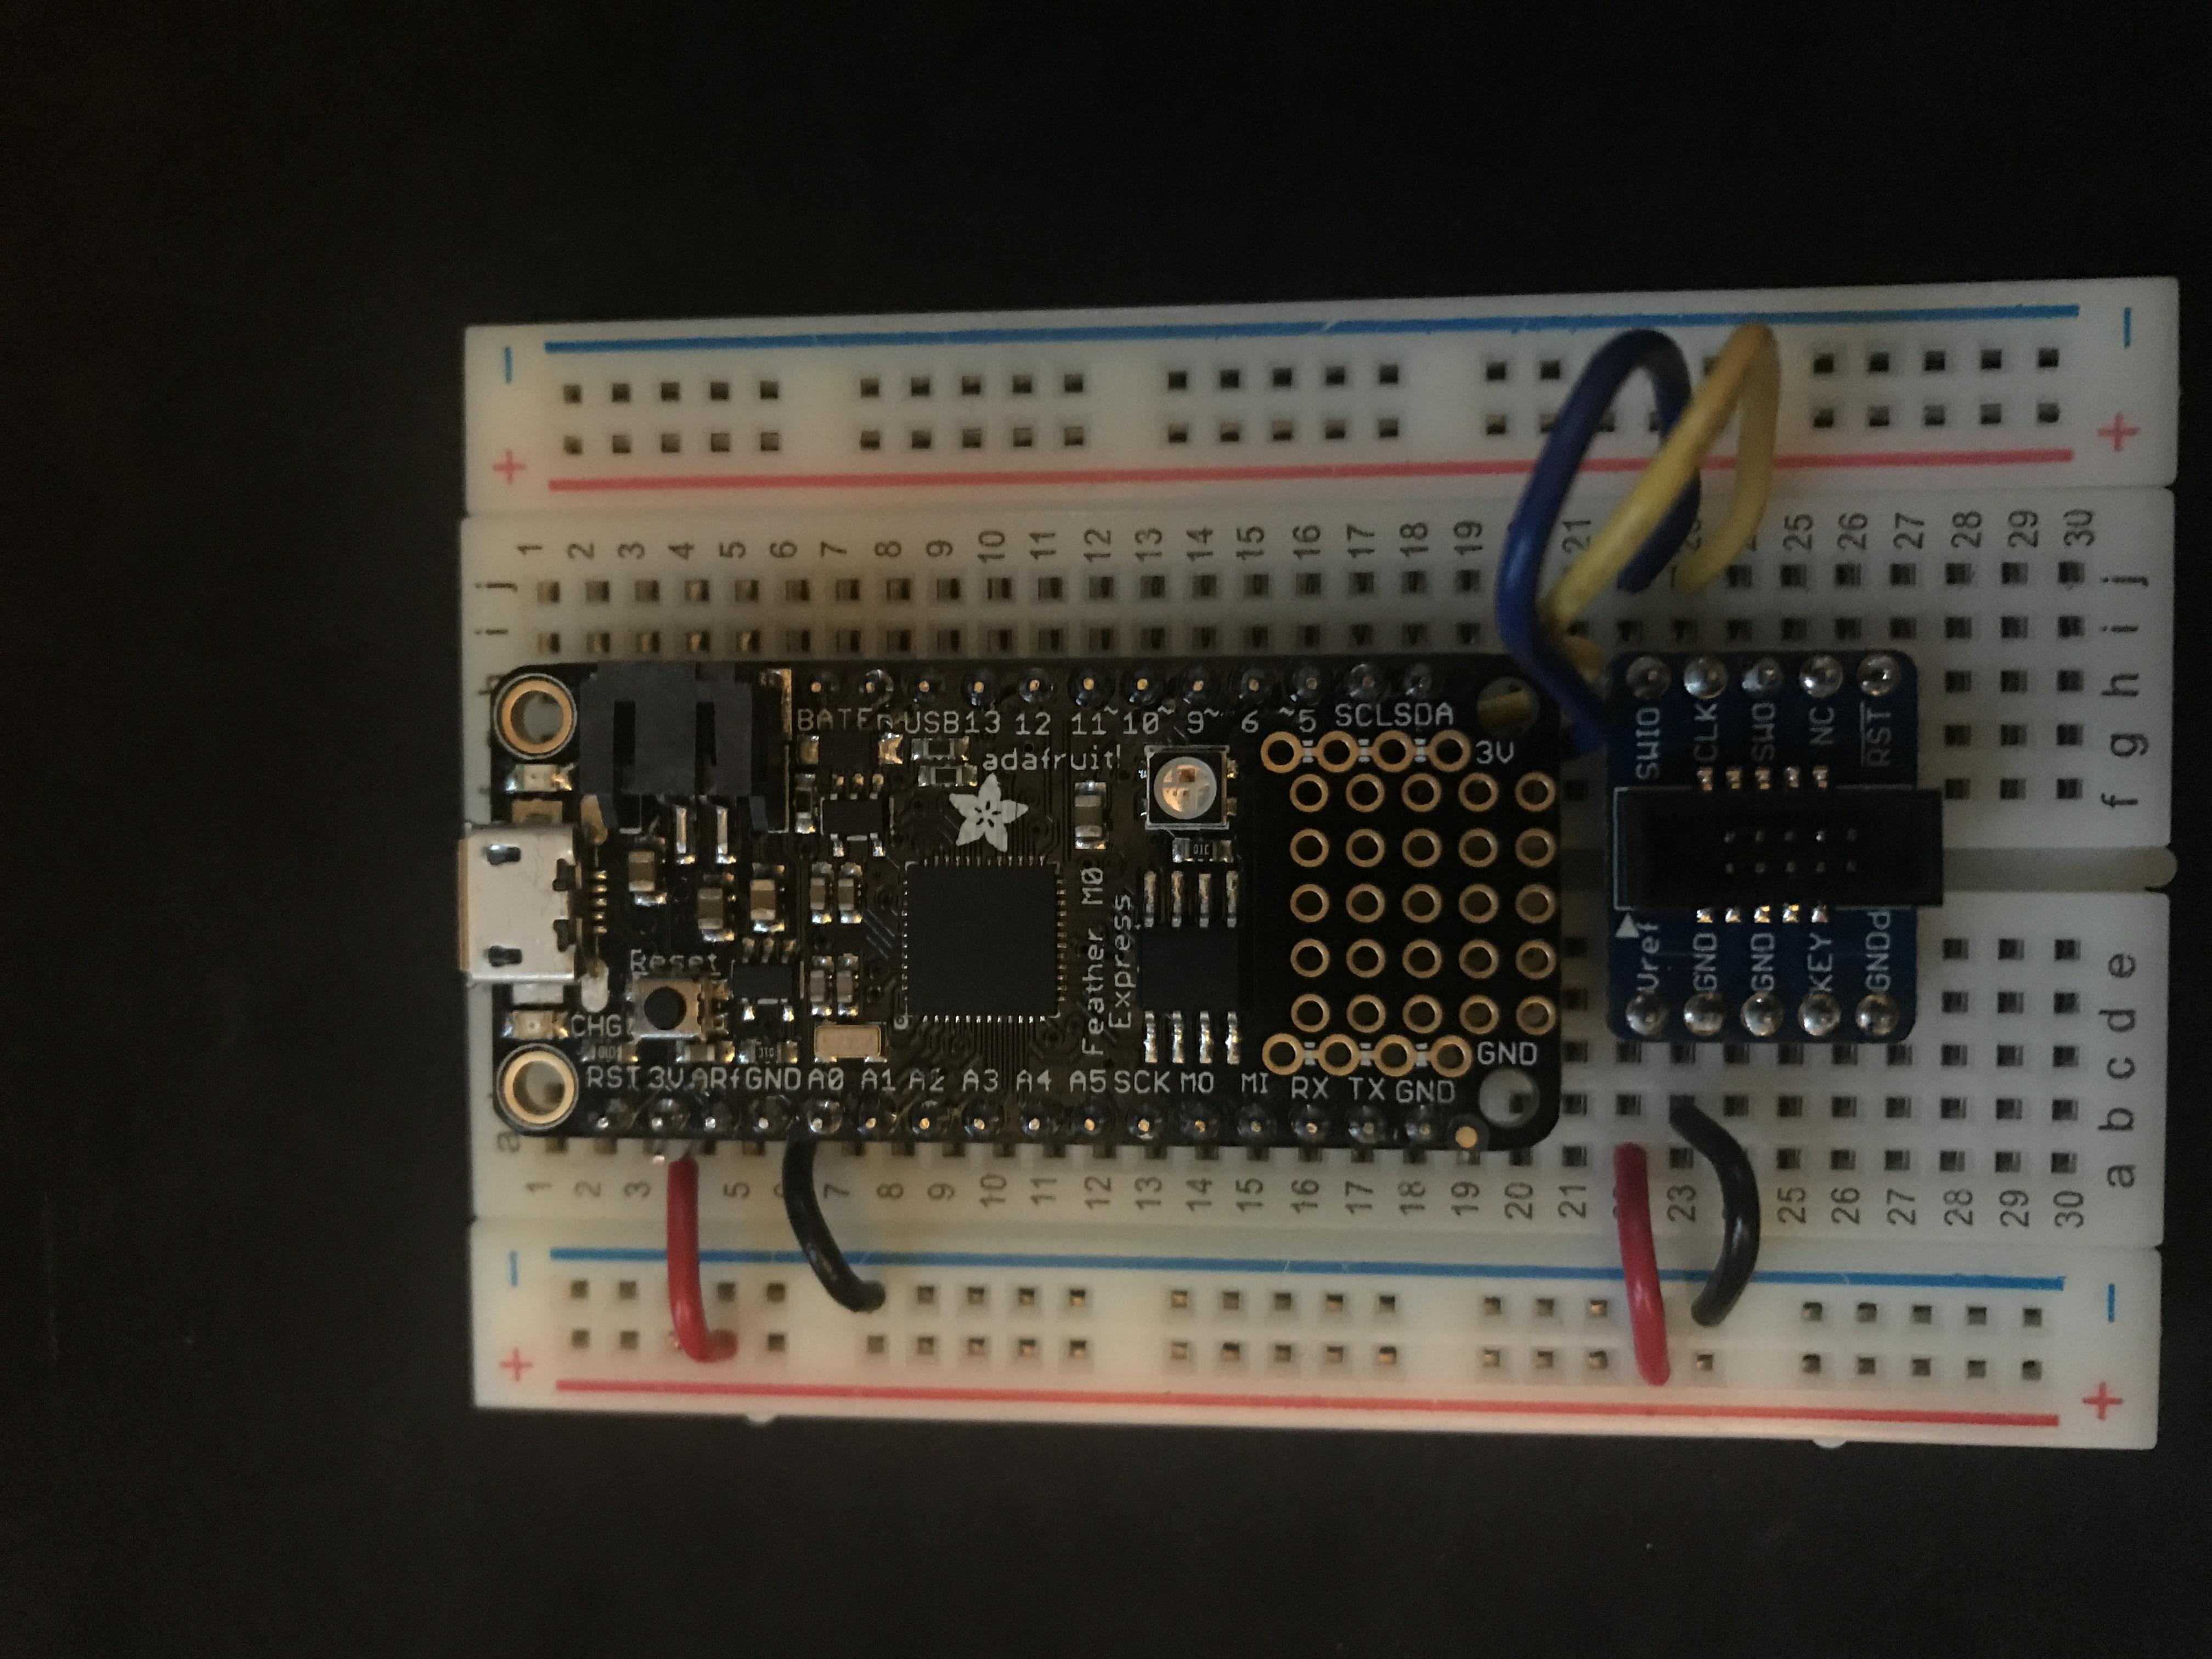 micropython___circuitpython_IMG_7687.jpg